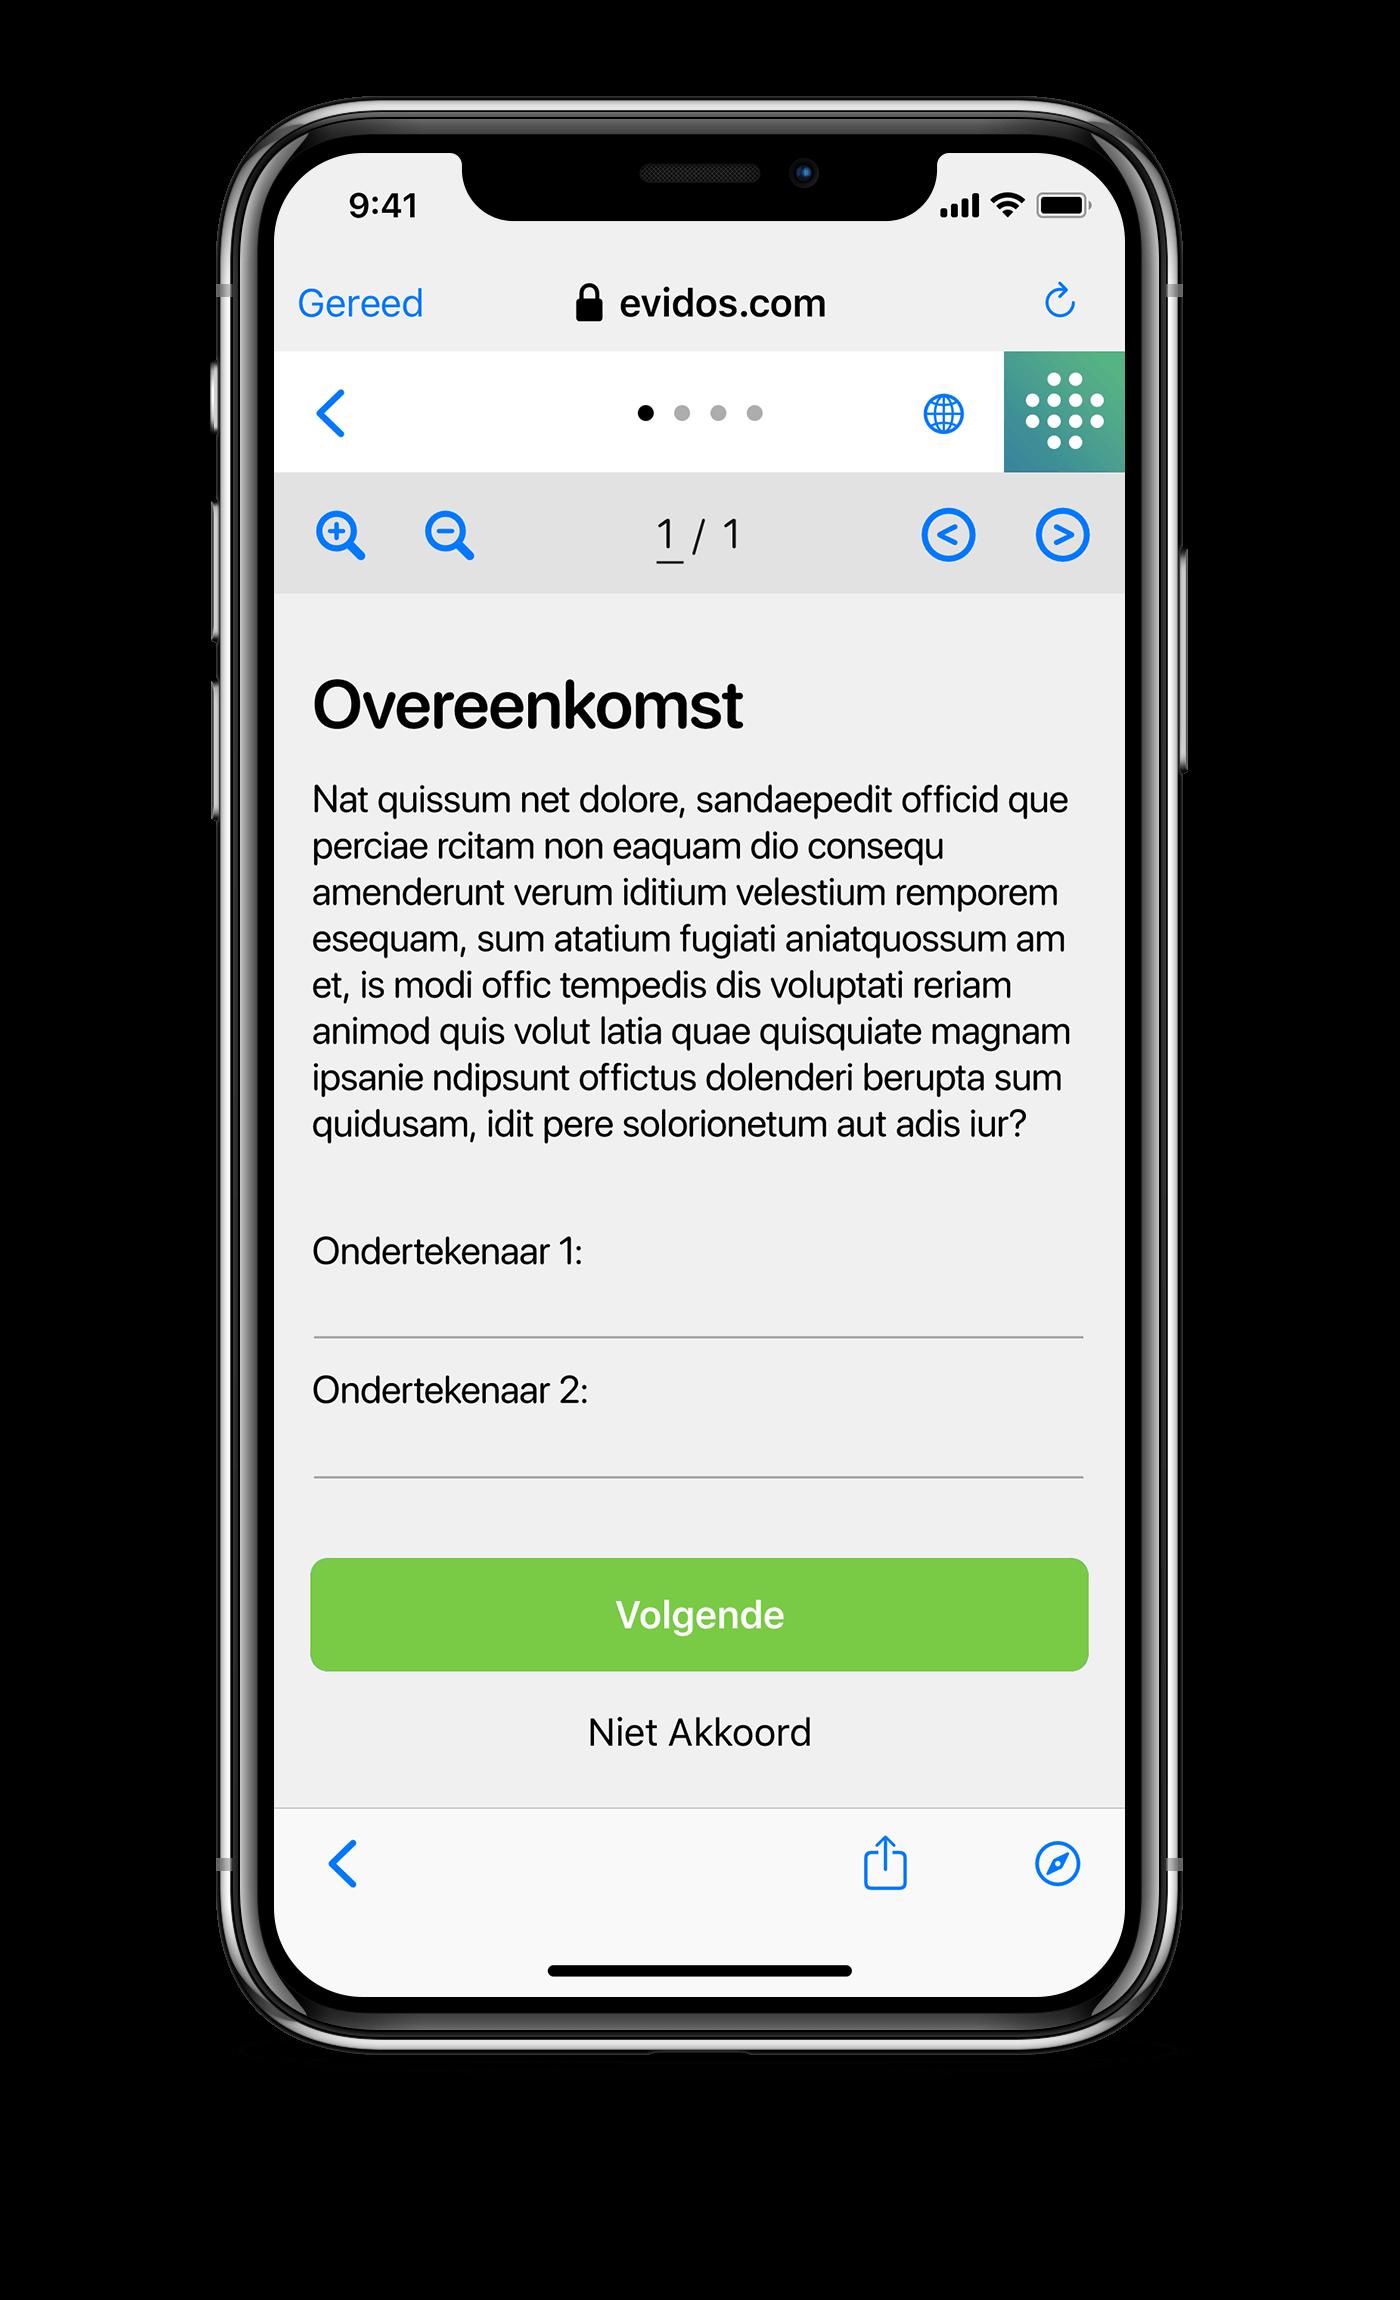 Ondertekenen-NL-stap-1